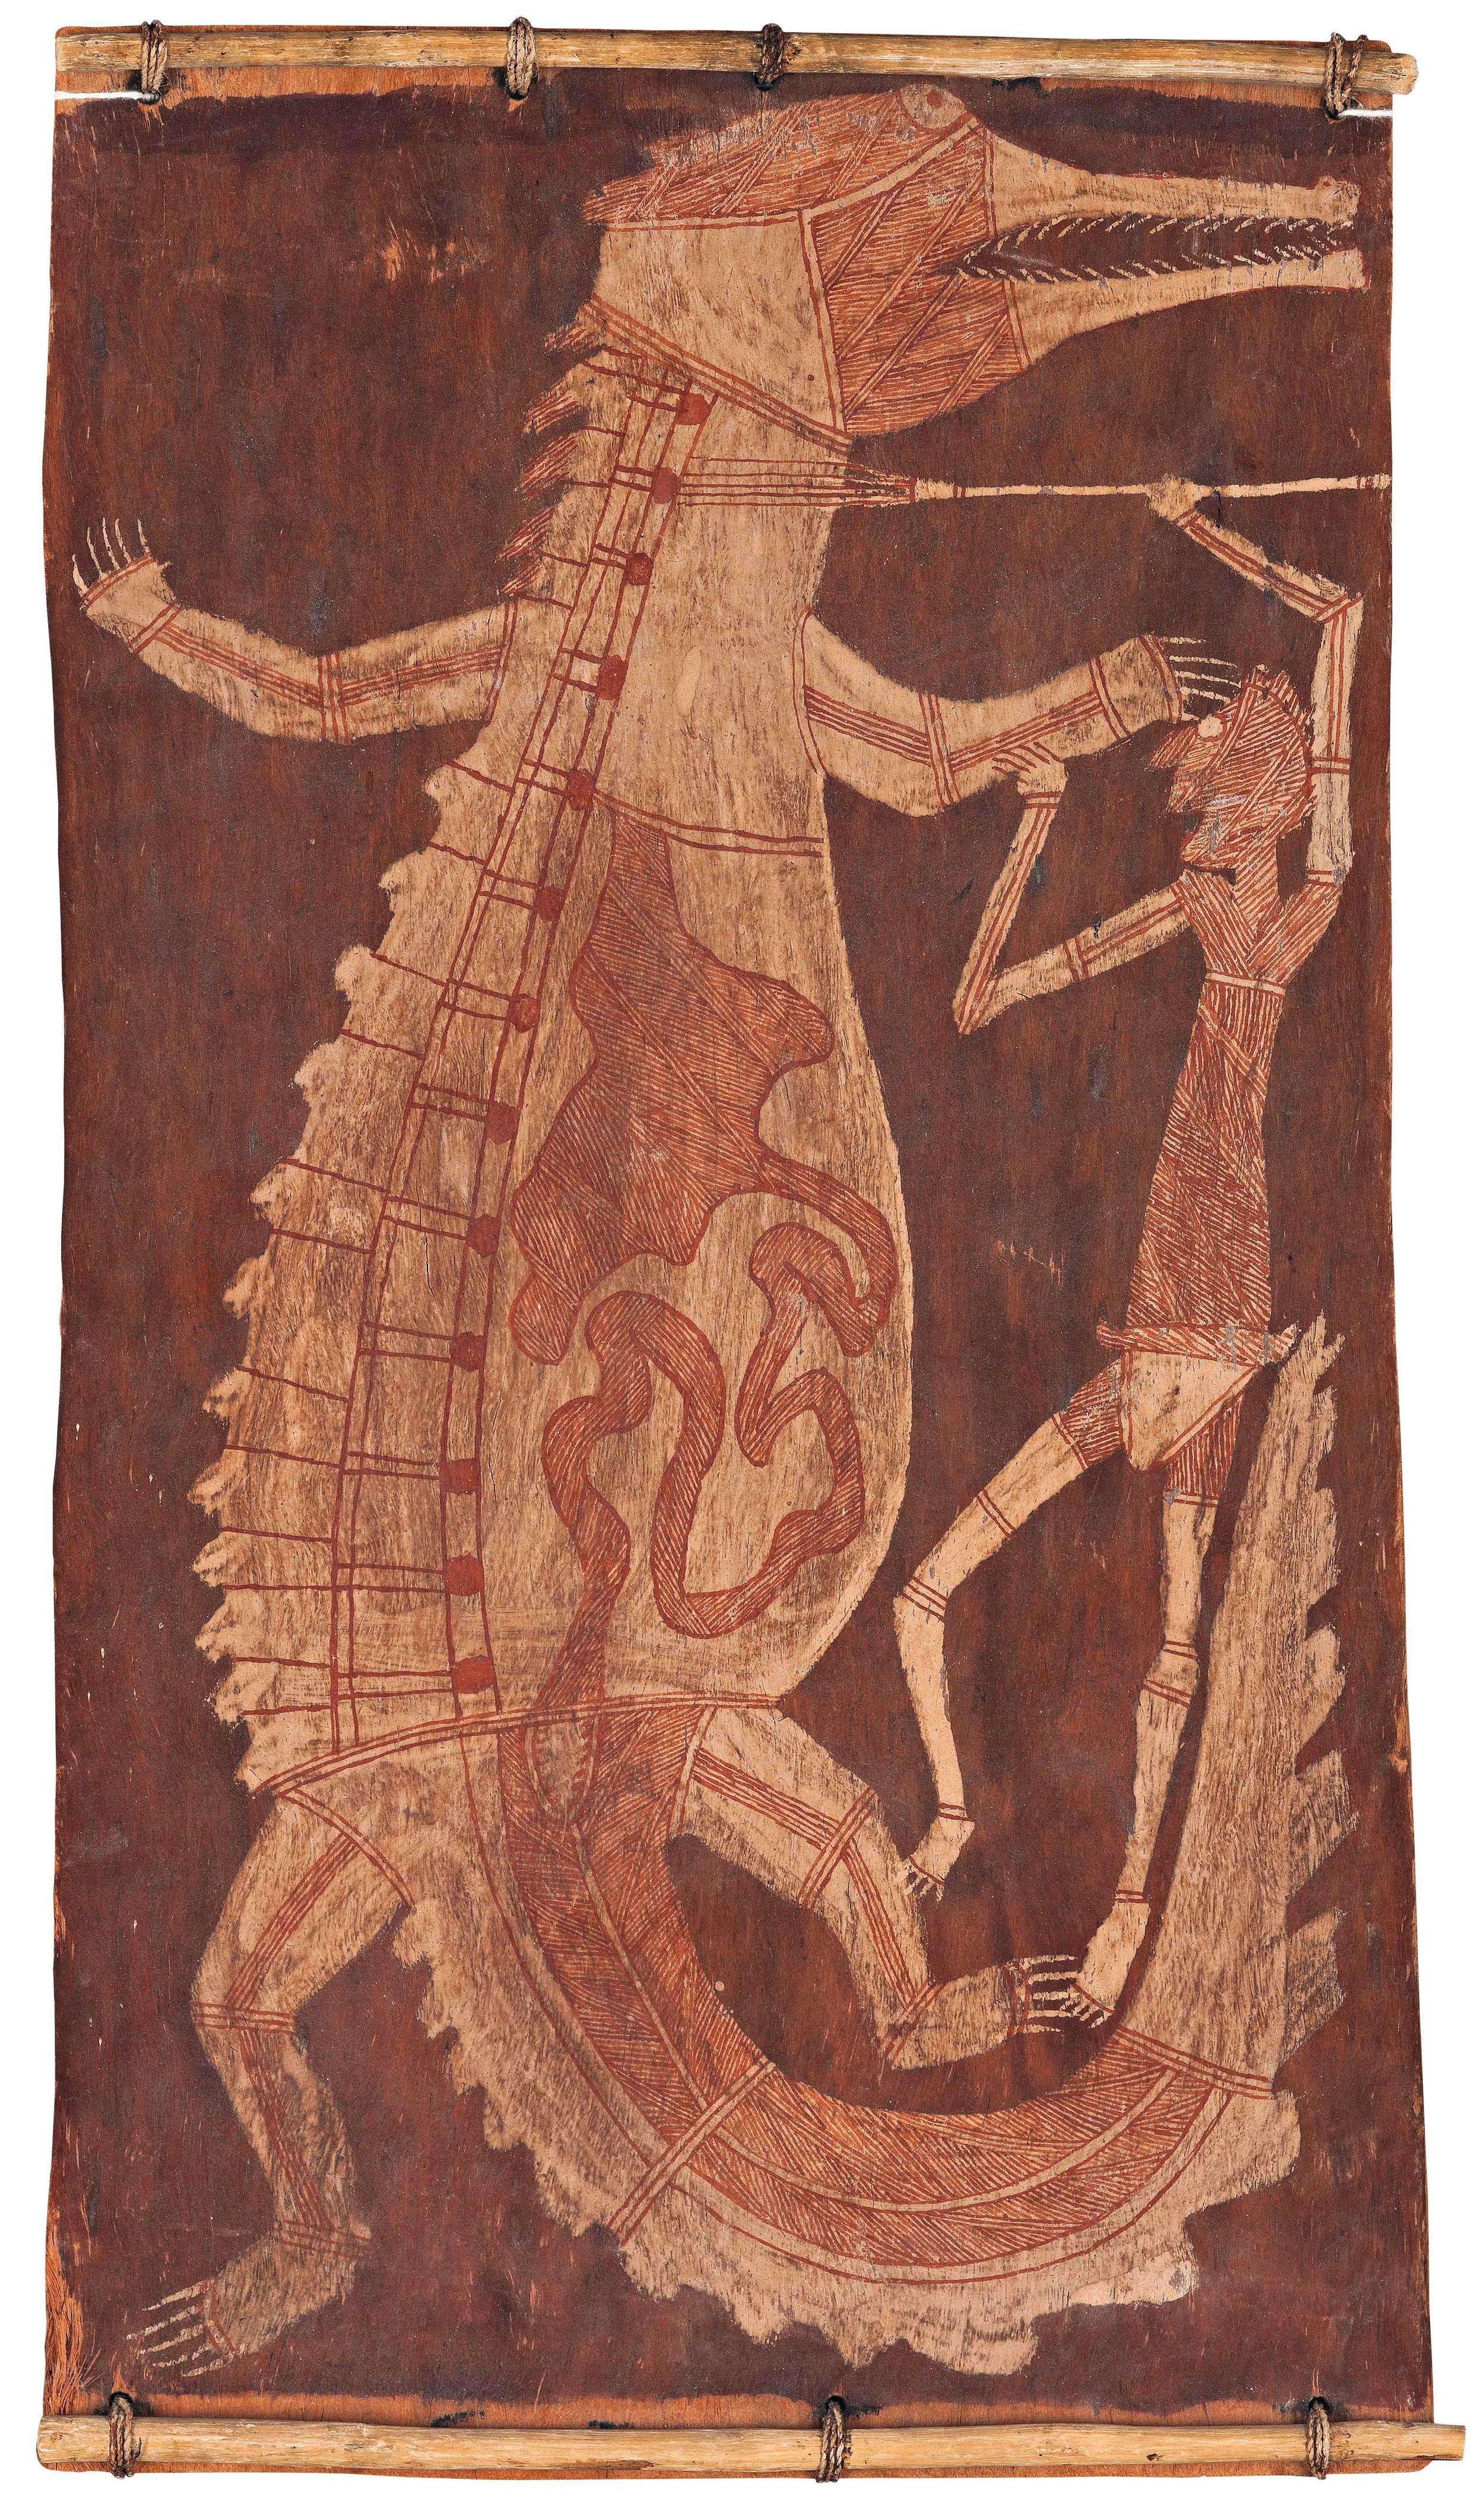 DICK NGULEINGULEI,1920–1988  Mimi Killing Crocodile , 1965